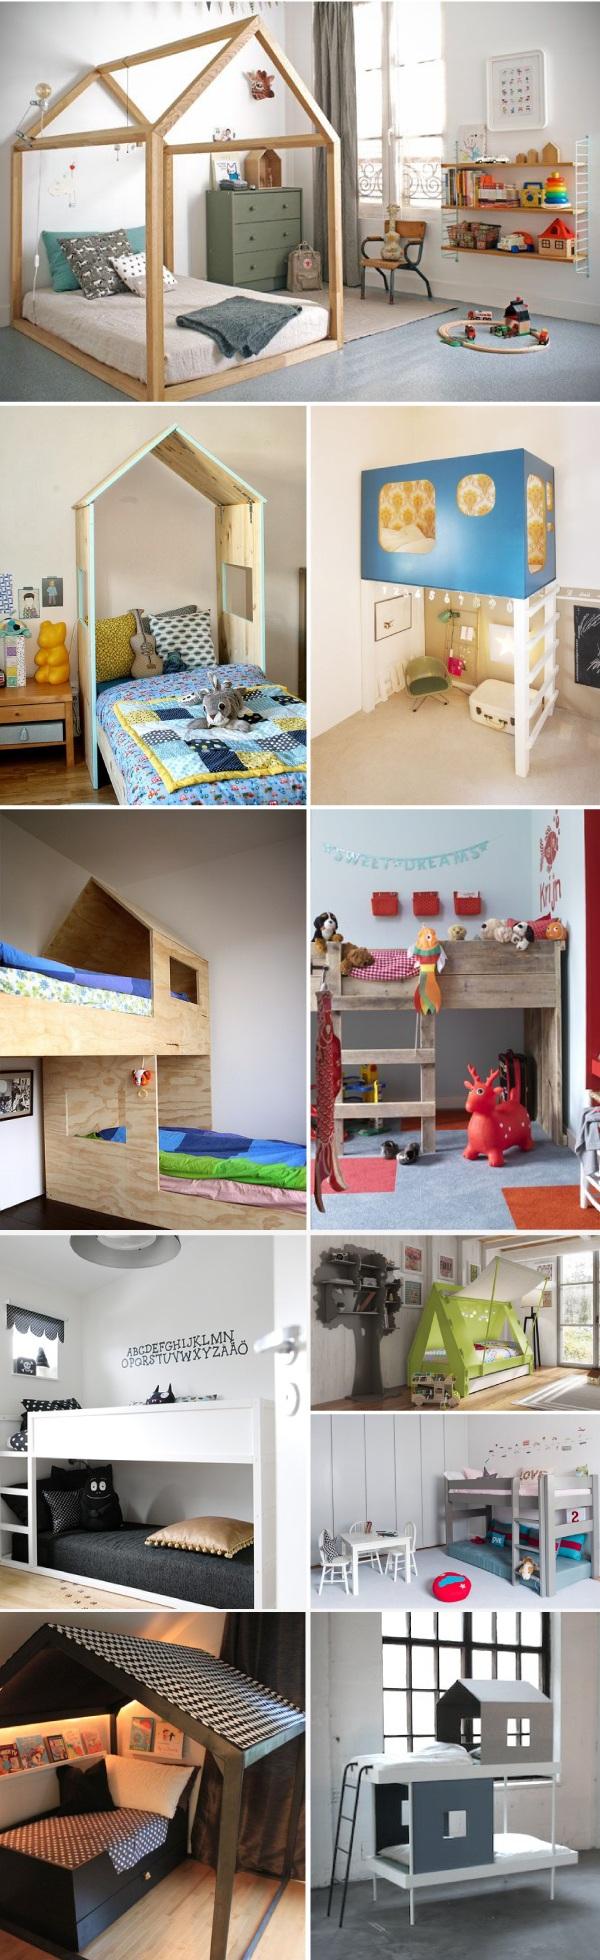 Quarto de crian a montessori new baby is coming for Decoracion habitacion infantil montessori